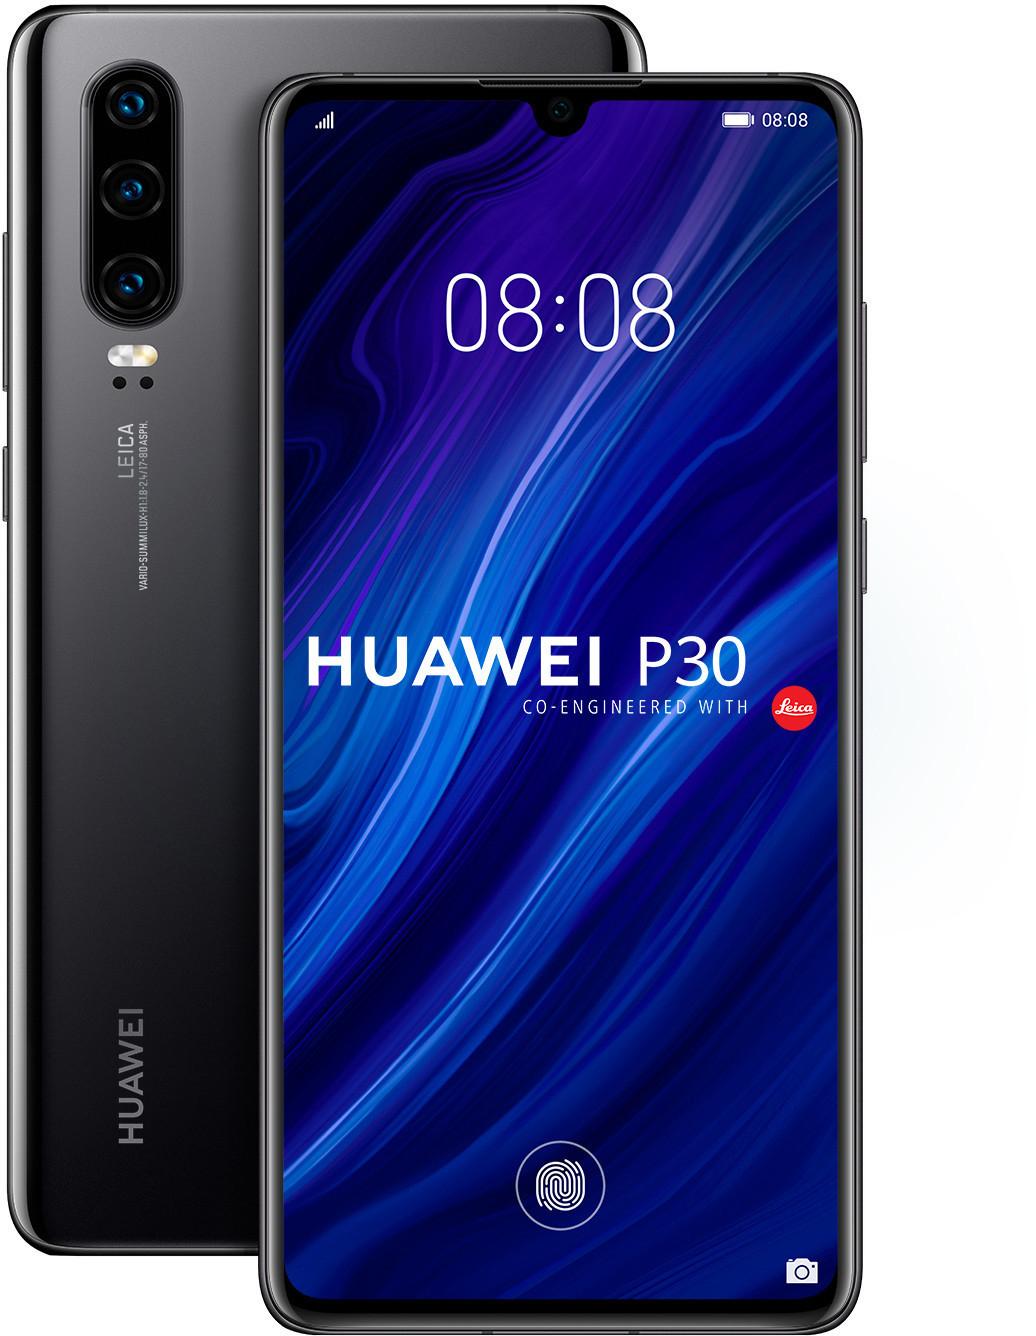 "Smartphone 6.1"" Huawei P30 - full HD+, Kirin 980, 6 Go RAM, 128 Go, différents coloris (via ODR de 50€)"